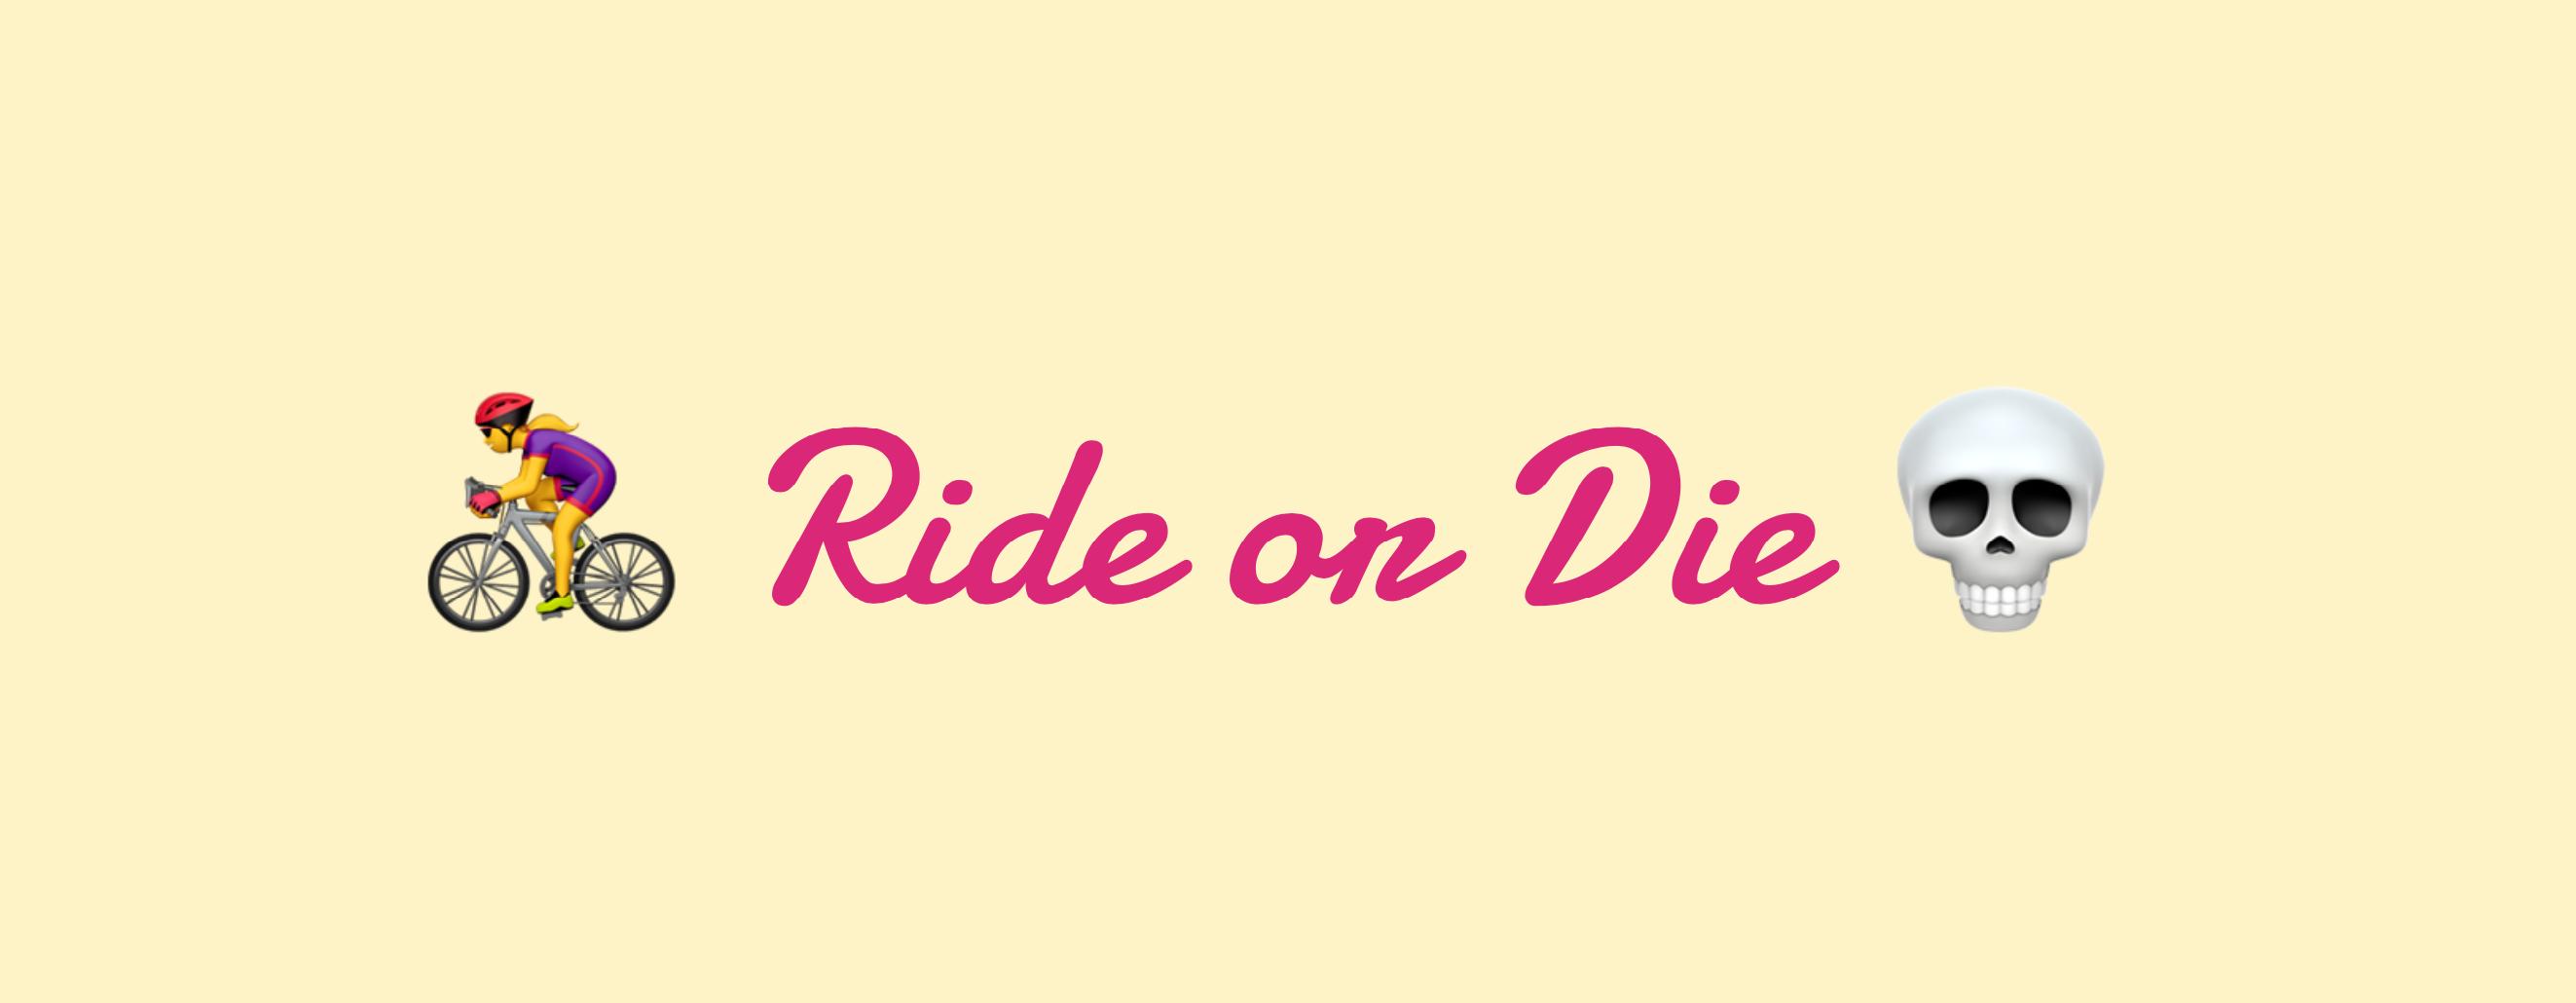 Ride or Die showcase